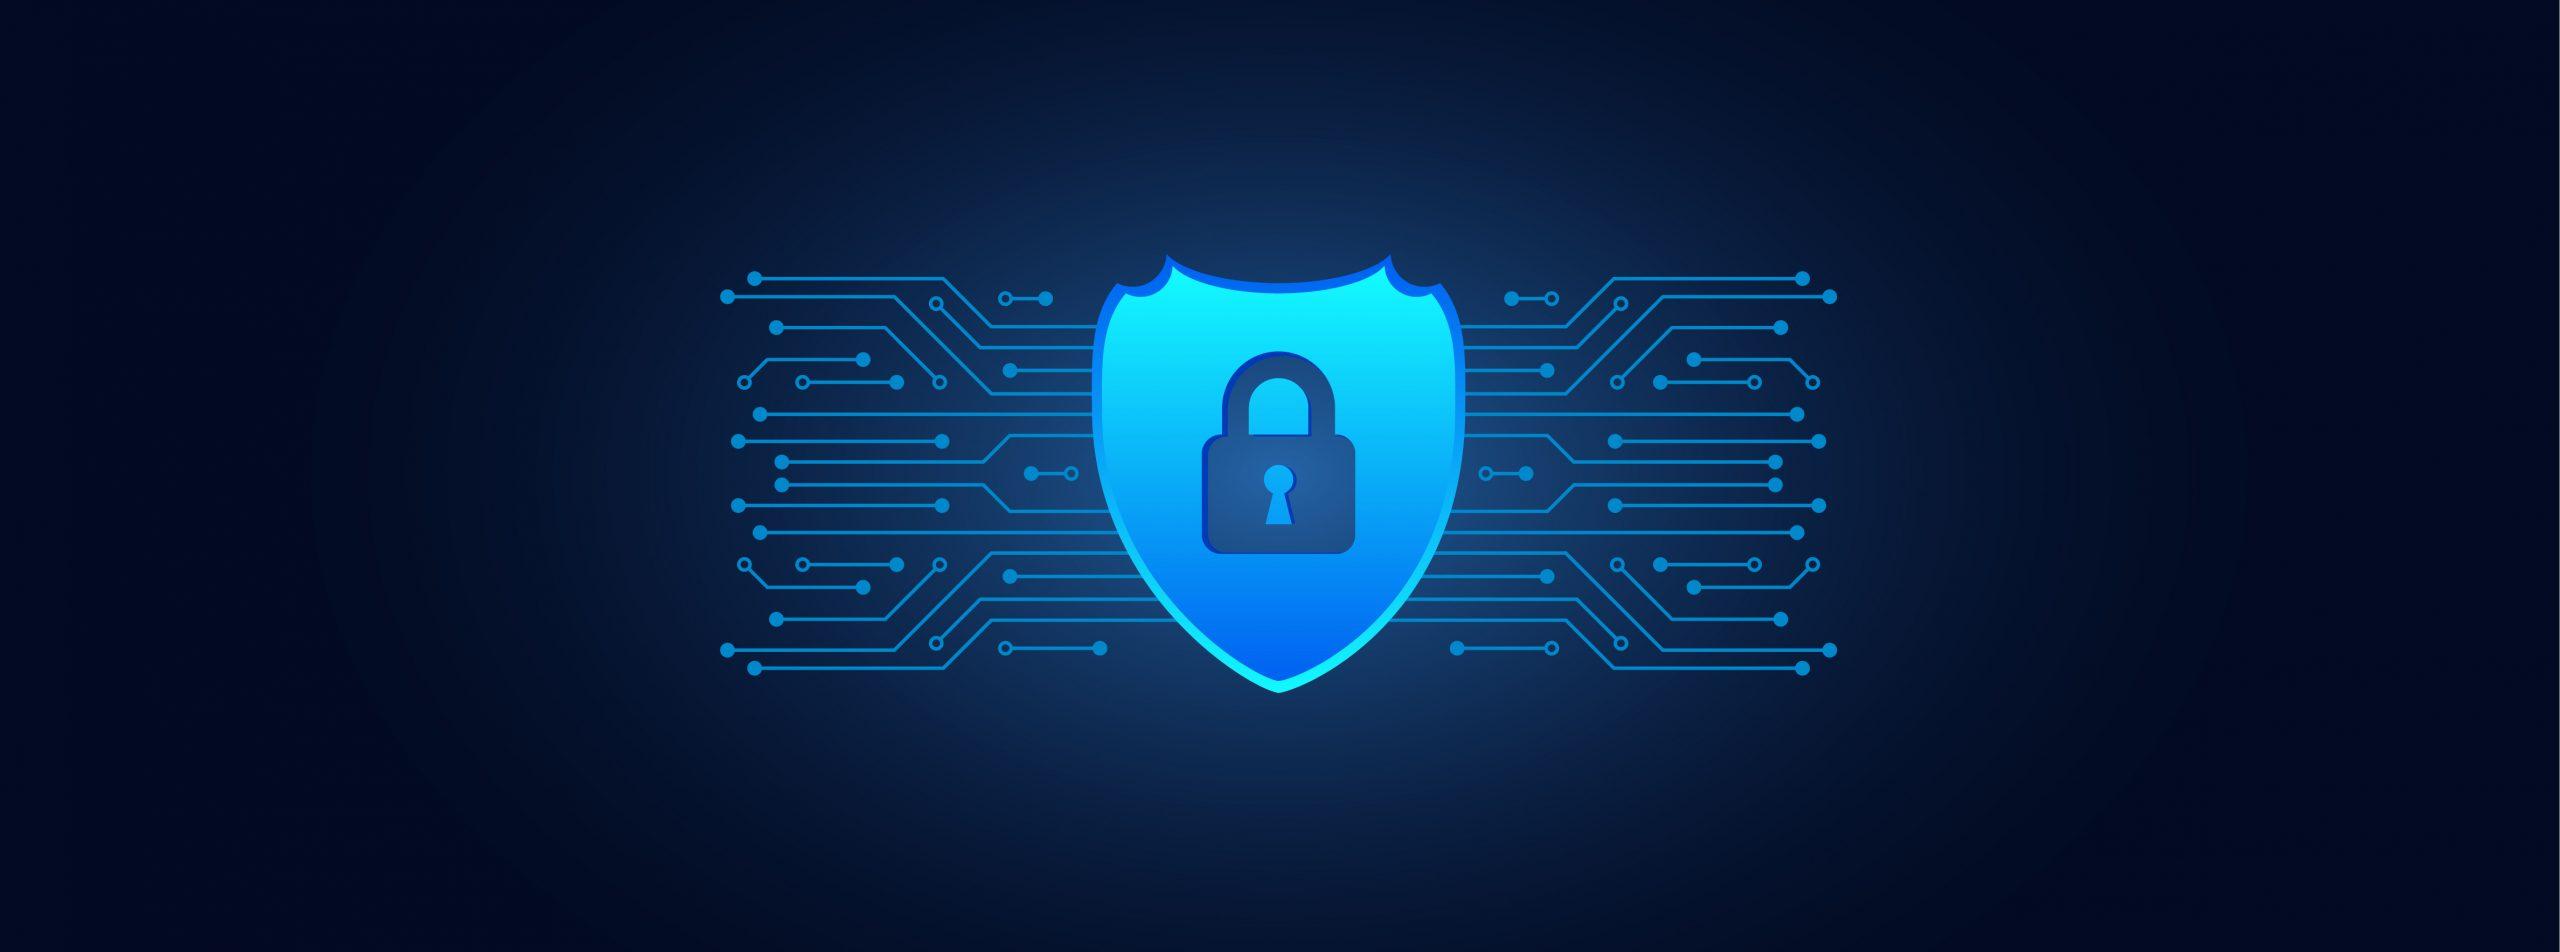 Technischer Datenschutz